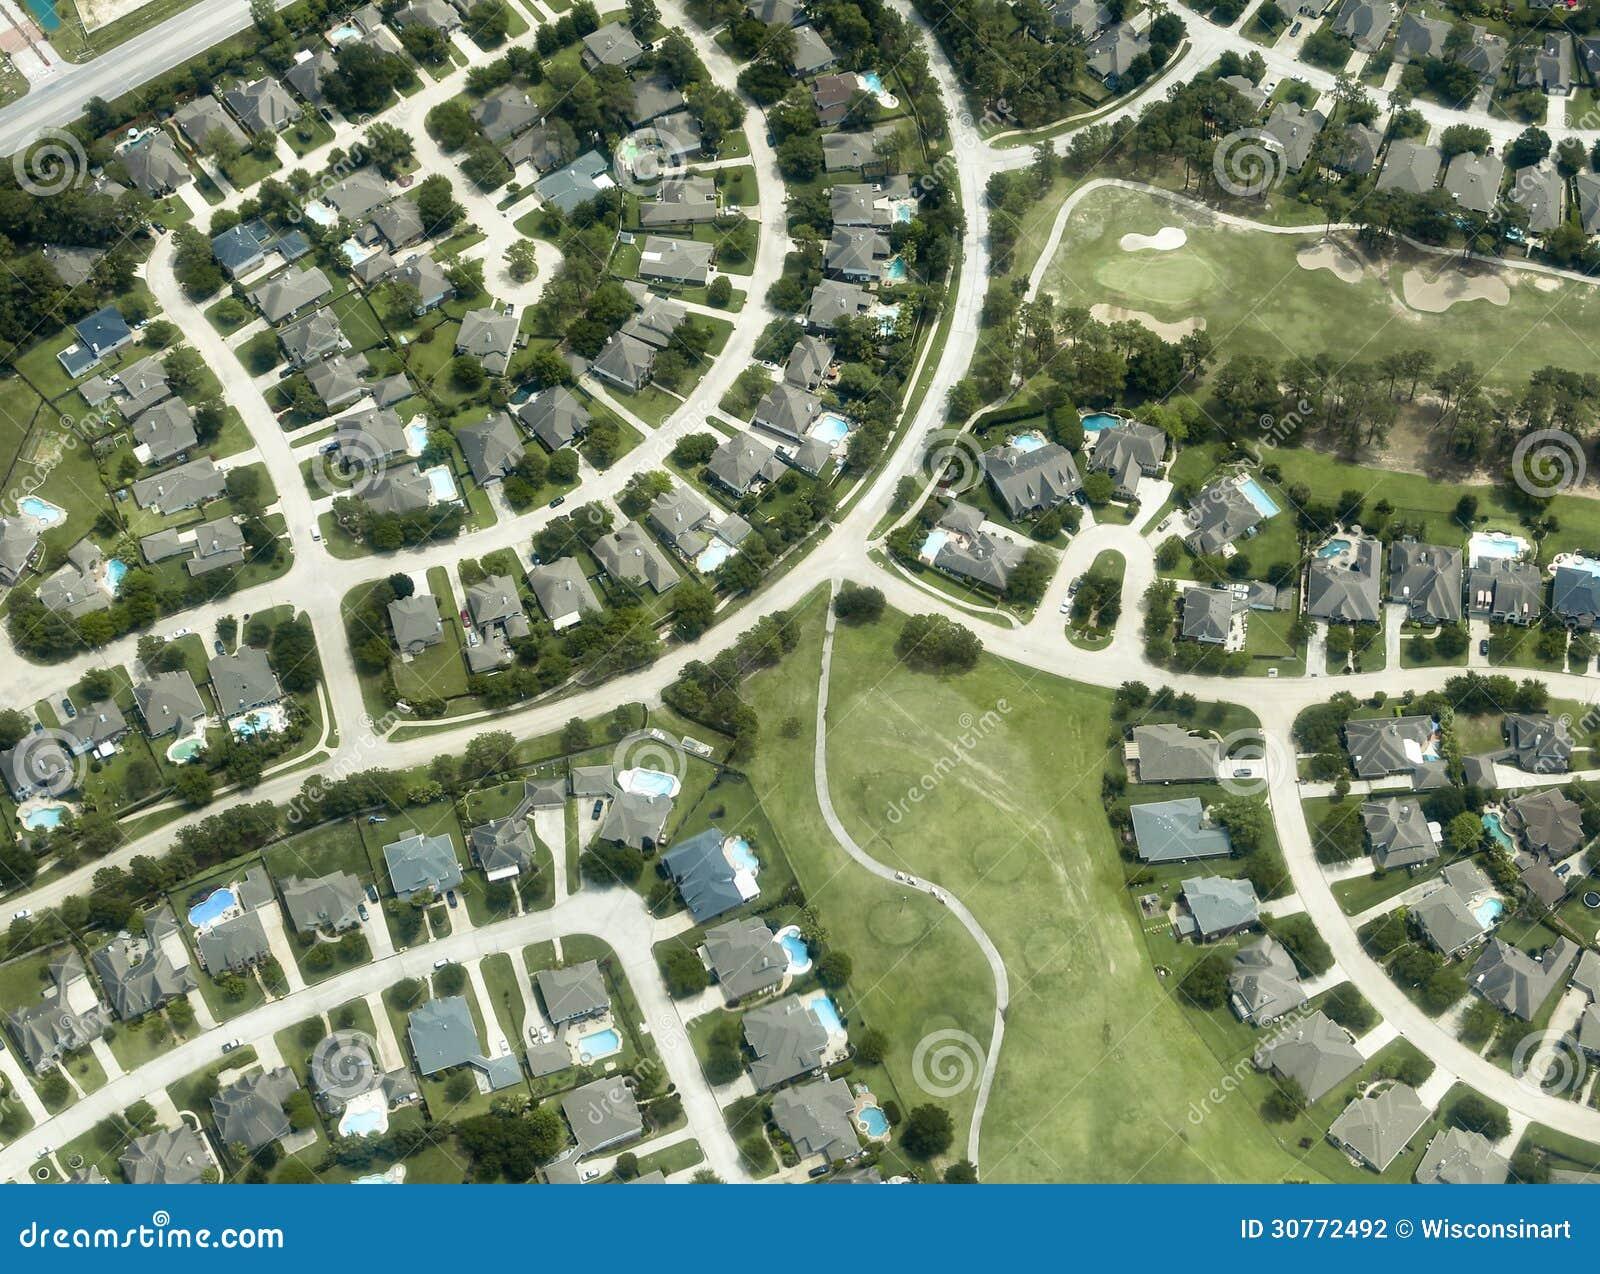 Houses, Homes, Neighborhood, Aerial View